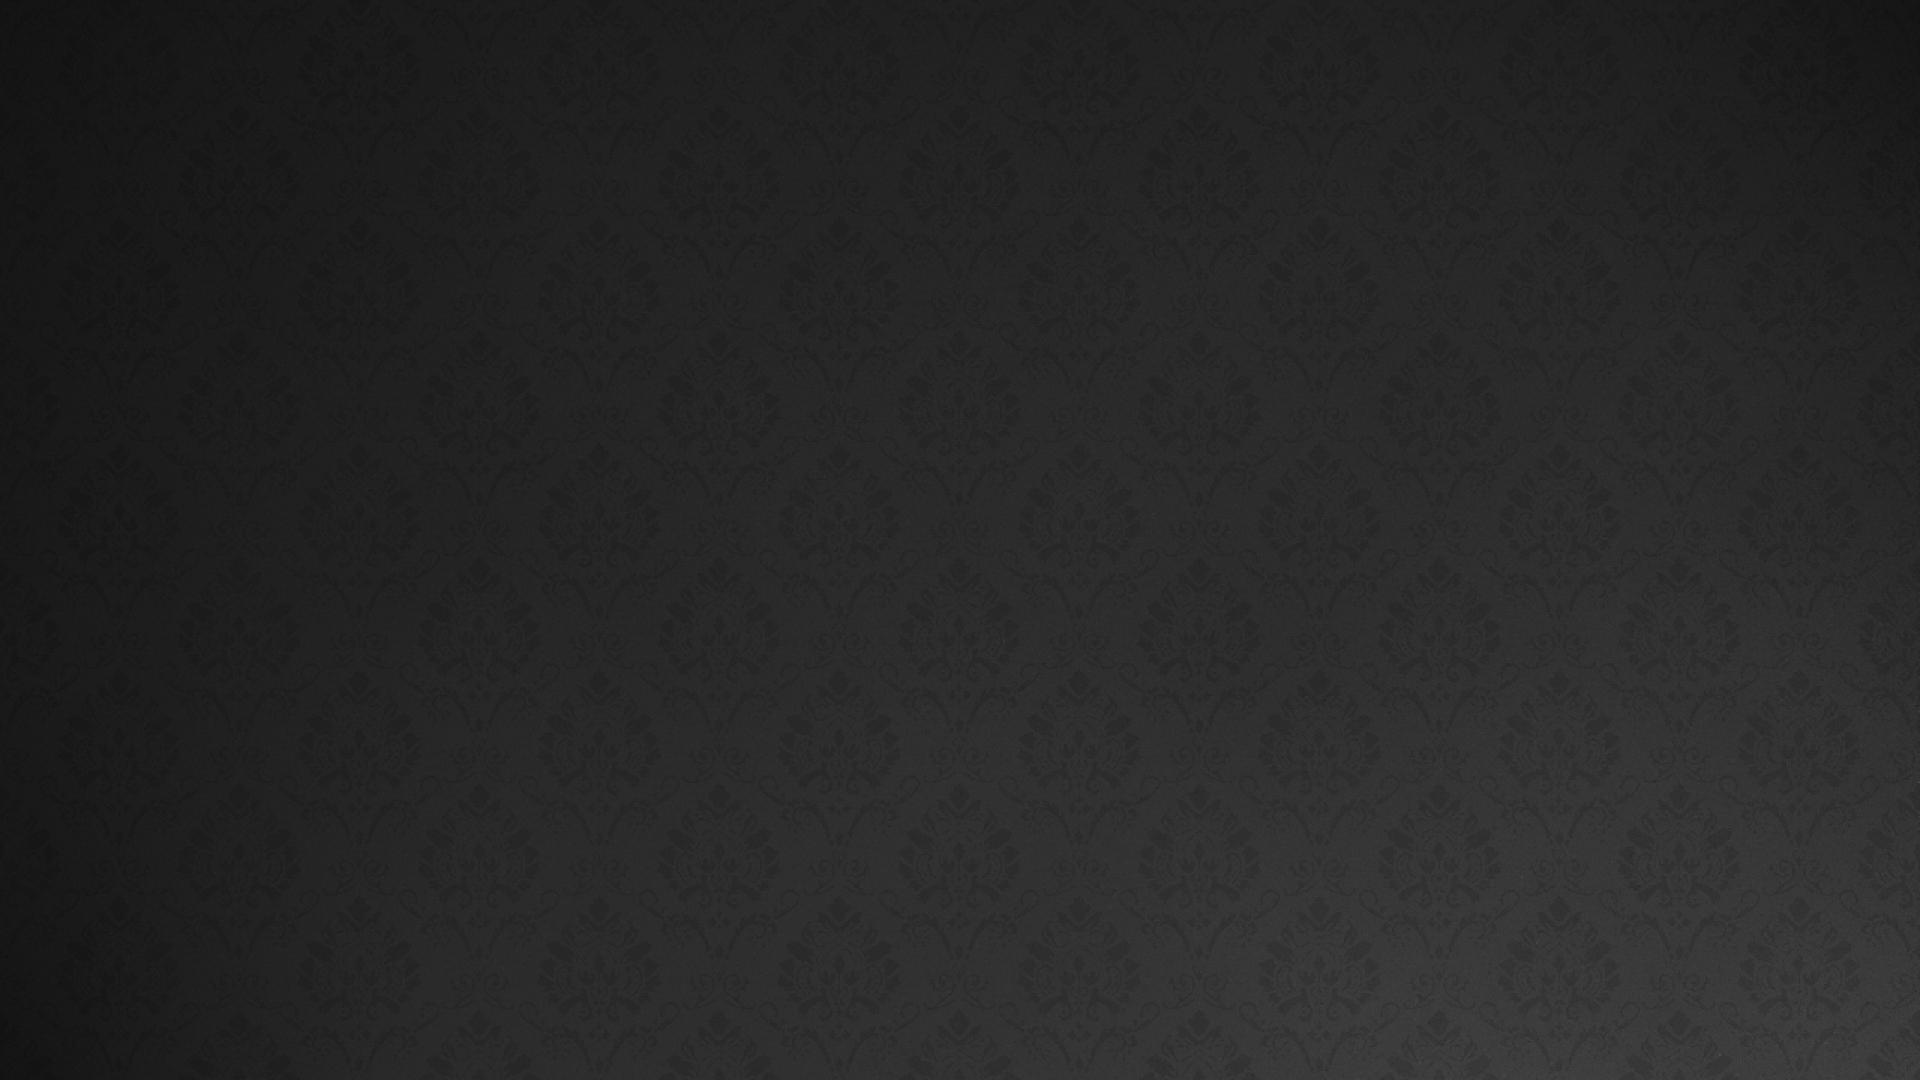 High Resolution Wallpaper | Grey 1920x1080 px